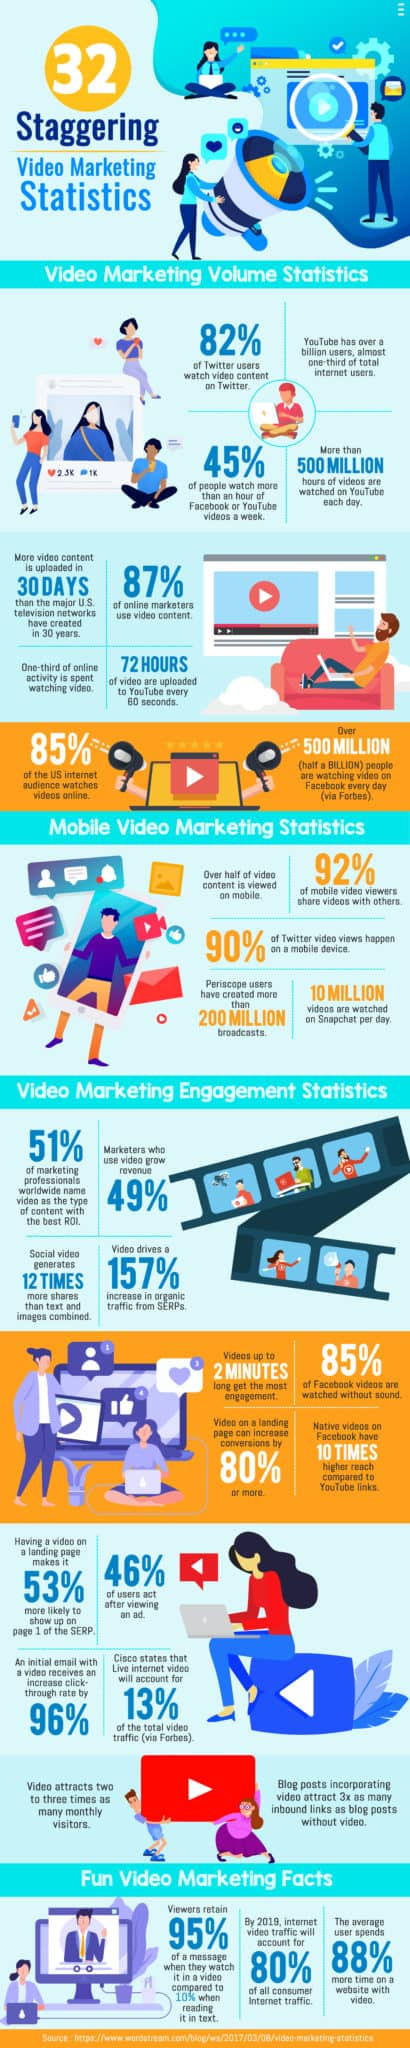 video marketing stats 2019